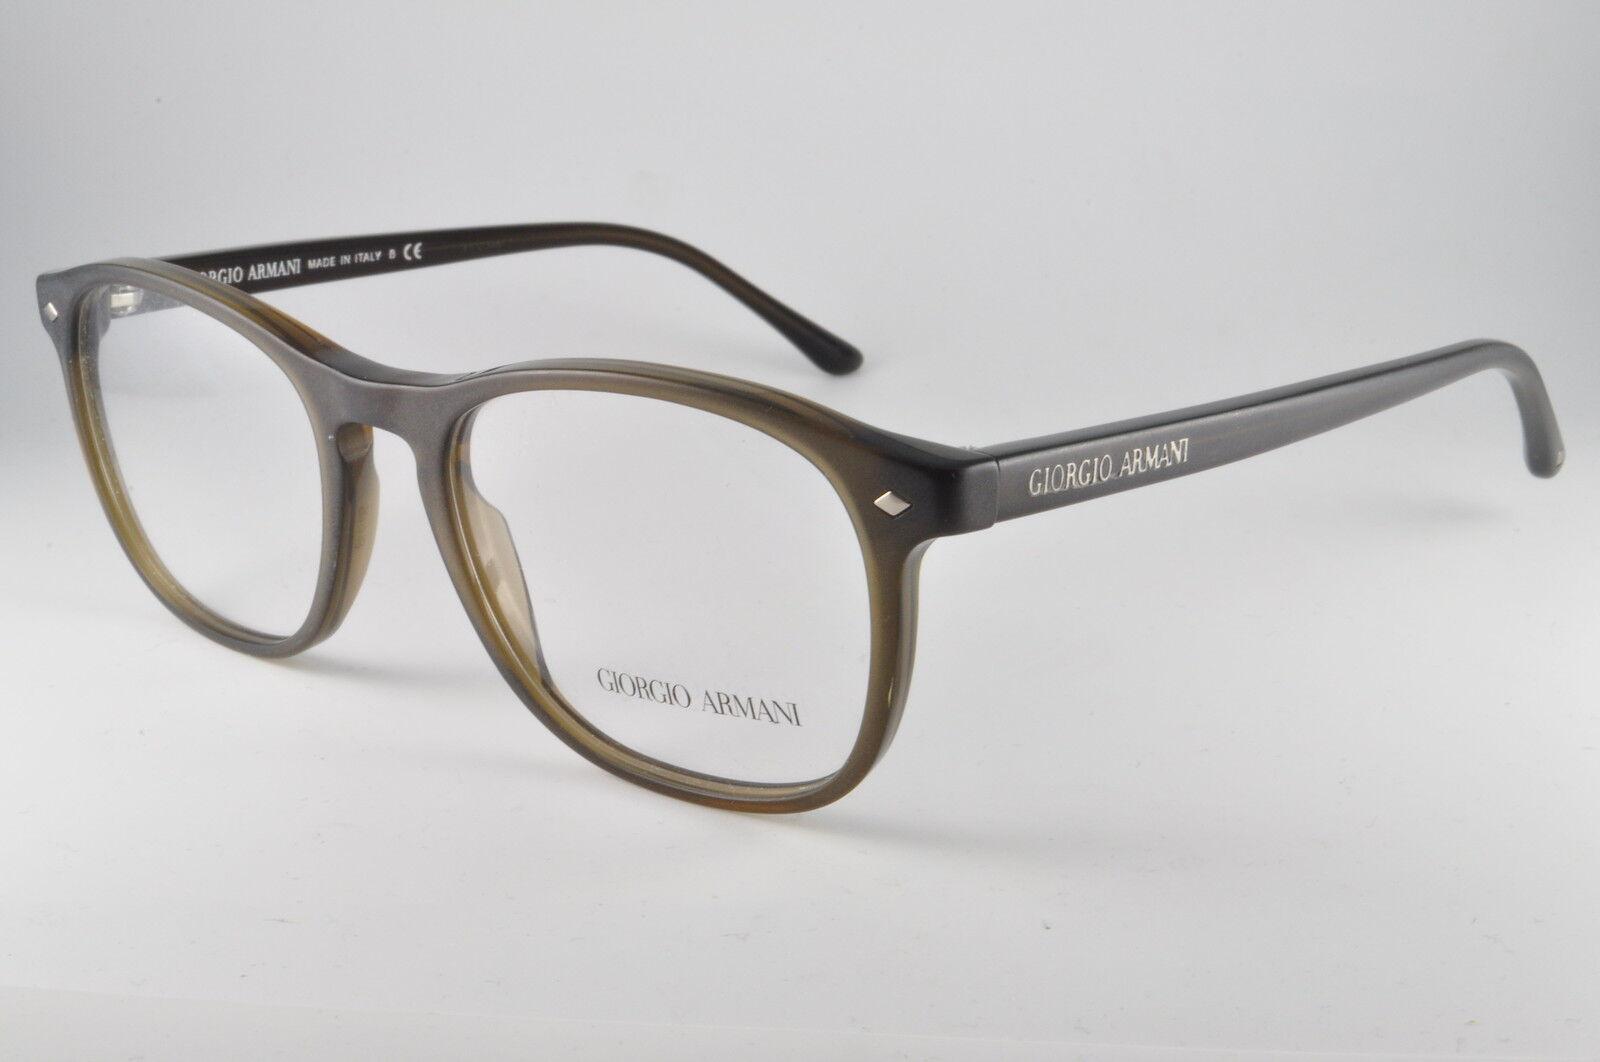 7c321563539 Giorgio Armani Eyeglasses AR 7003 5005 Matte Green Transparent 50mm ...